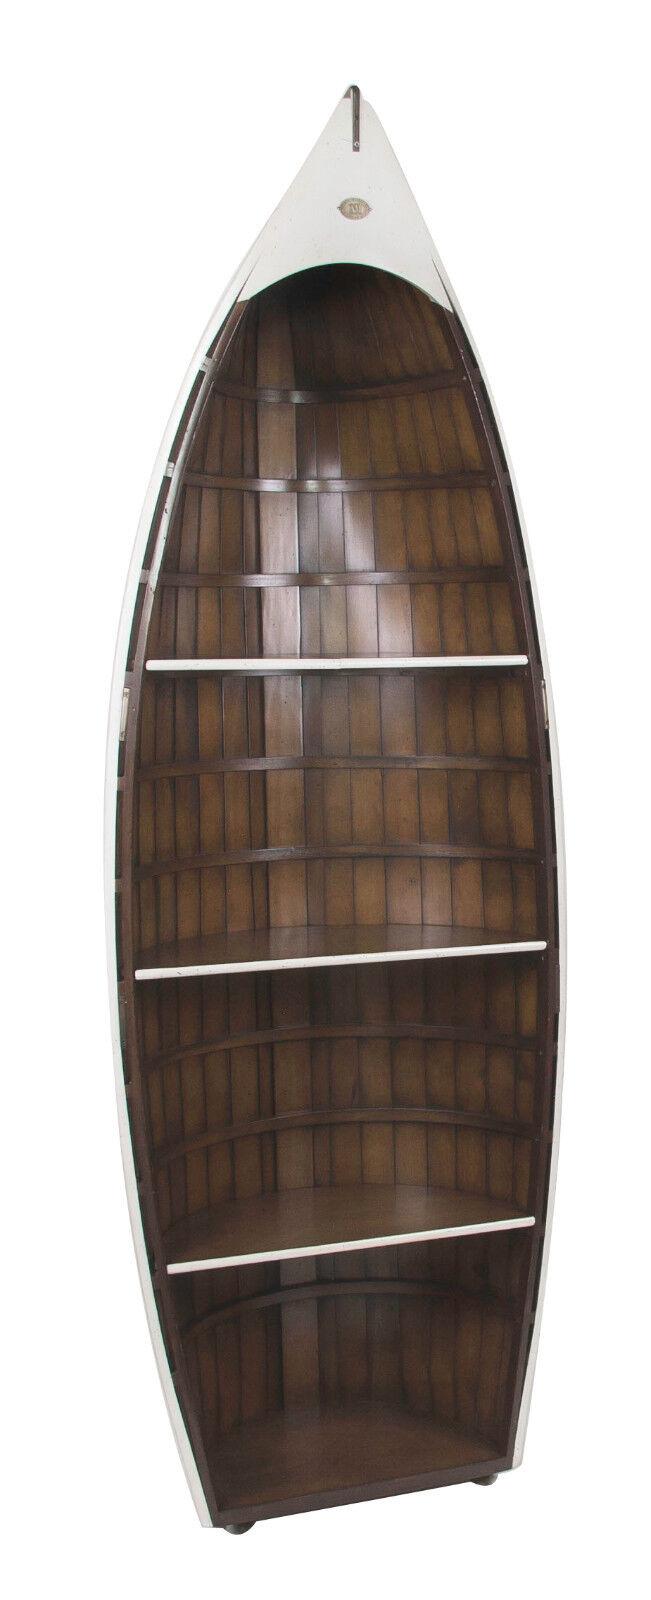 Bosun S Gig White Row Boat Bookcase 73 Bookshelve Wooden Nautical Decor New